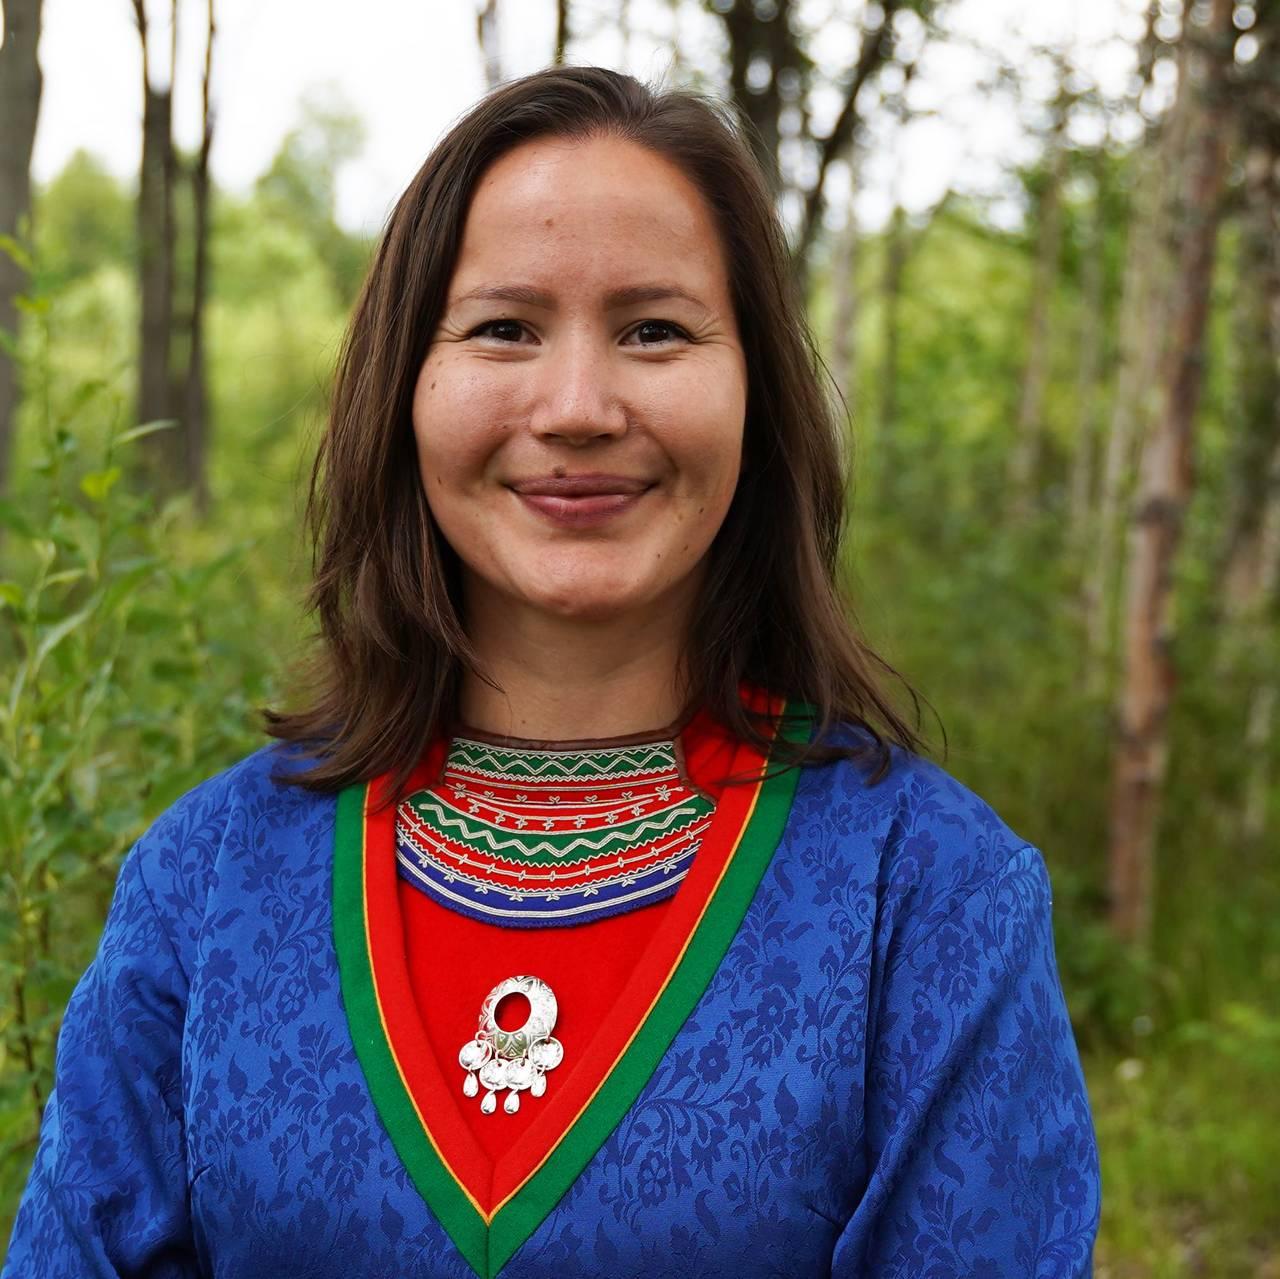 Bilde av Maja Kristine Jåma (28)